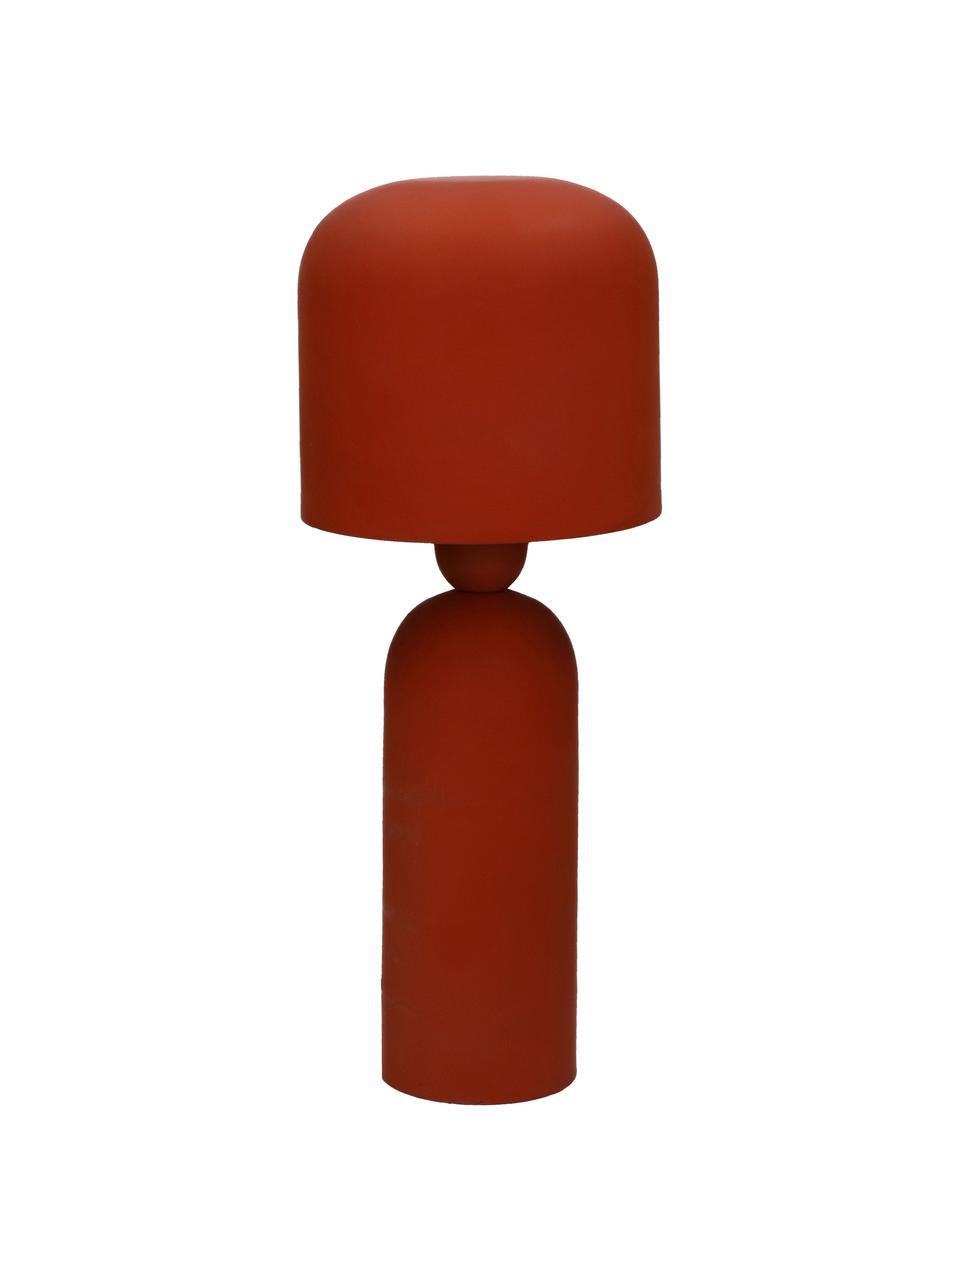 Design Tischlampe Bul in Rot, Lampenschirm: Metall, beschichtet, Lampenfuß: Metall, beschichtet, Terrakottarot, Ø 15 x H 35 cm